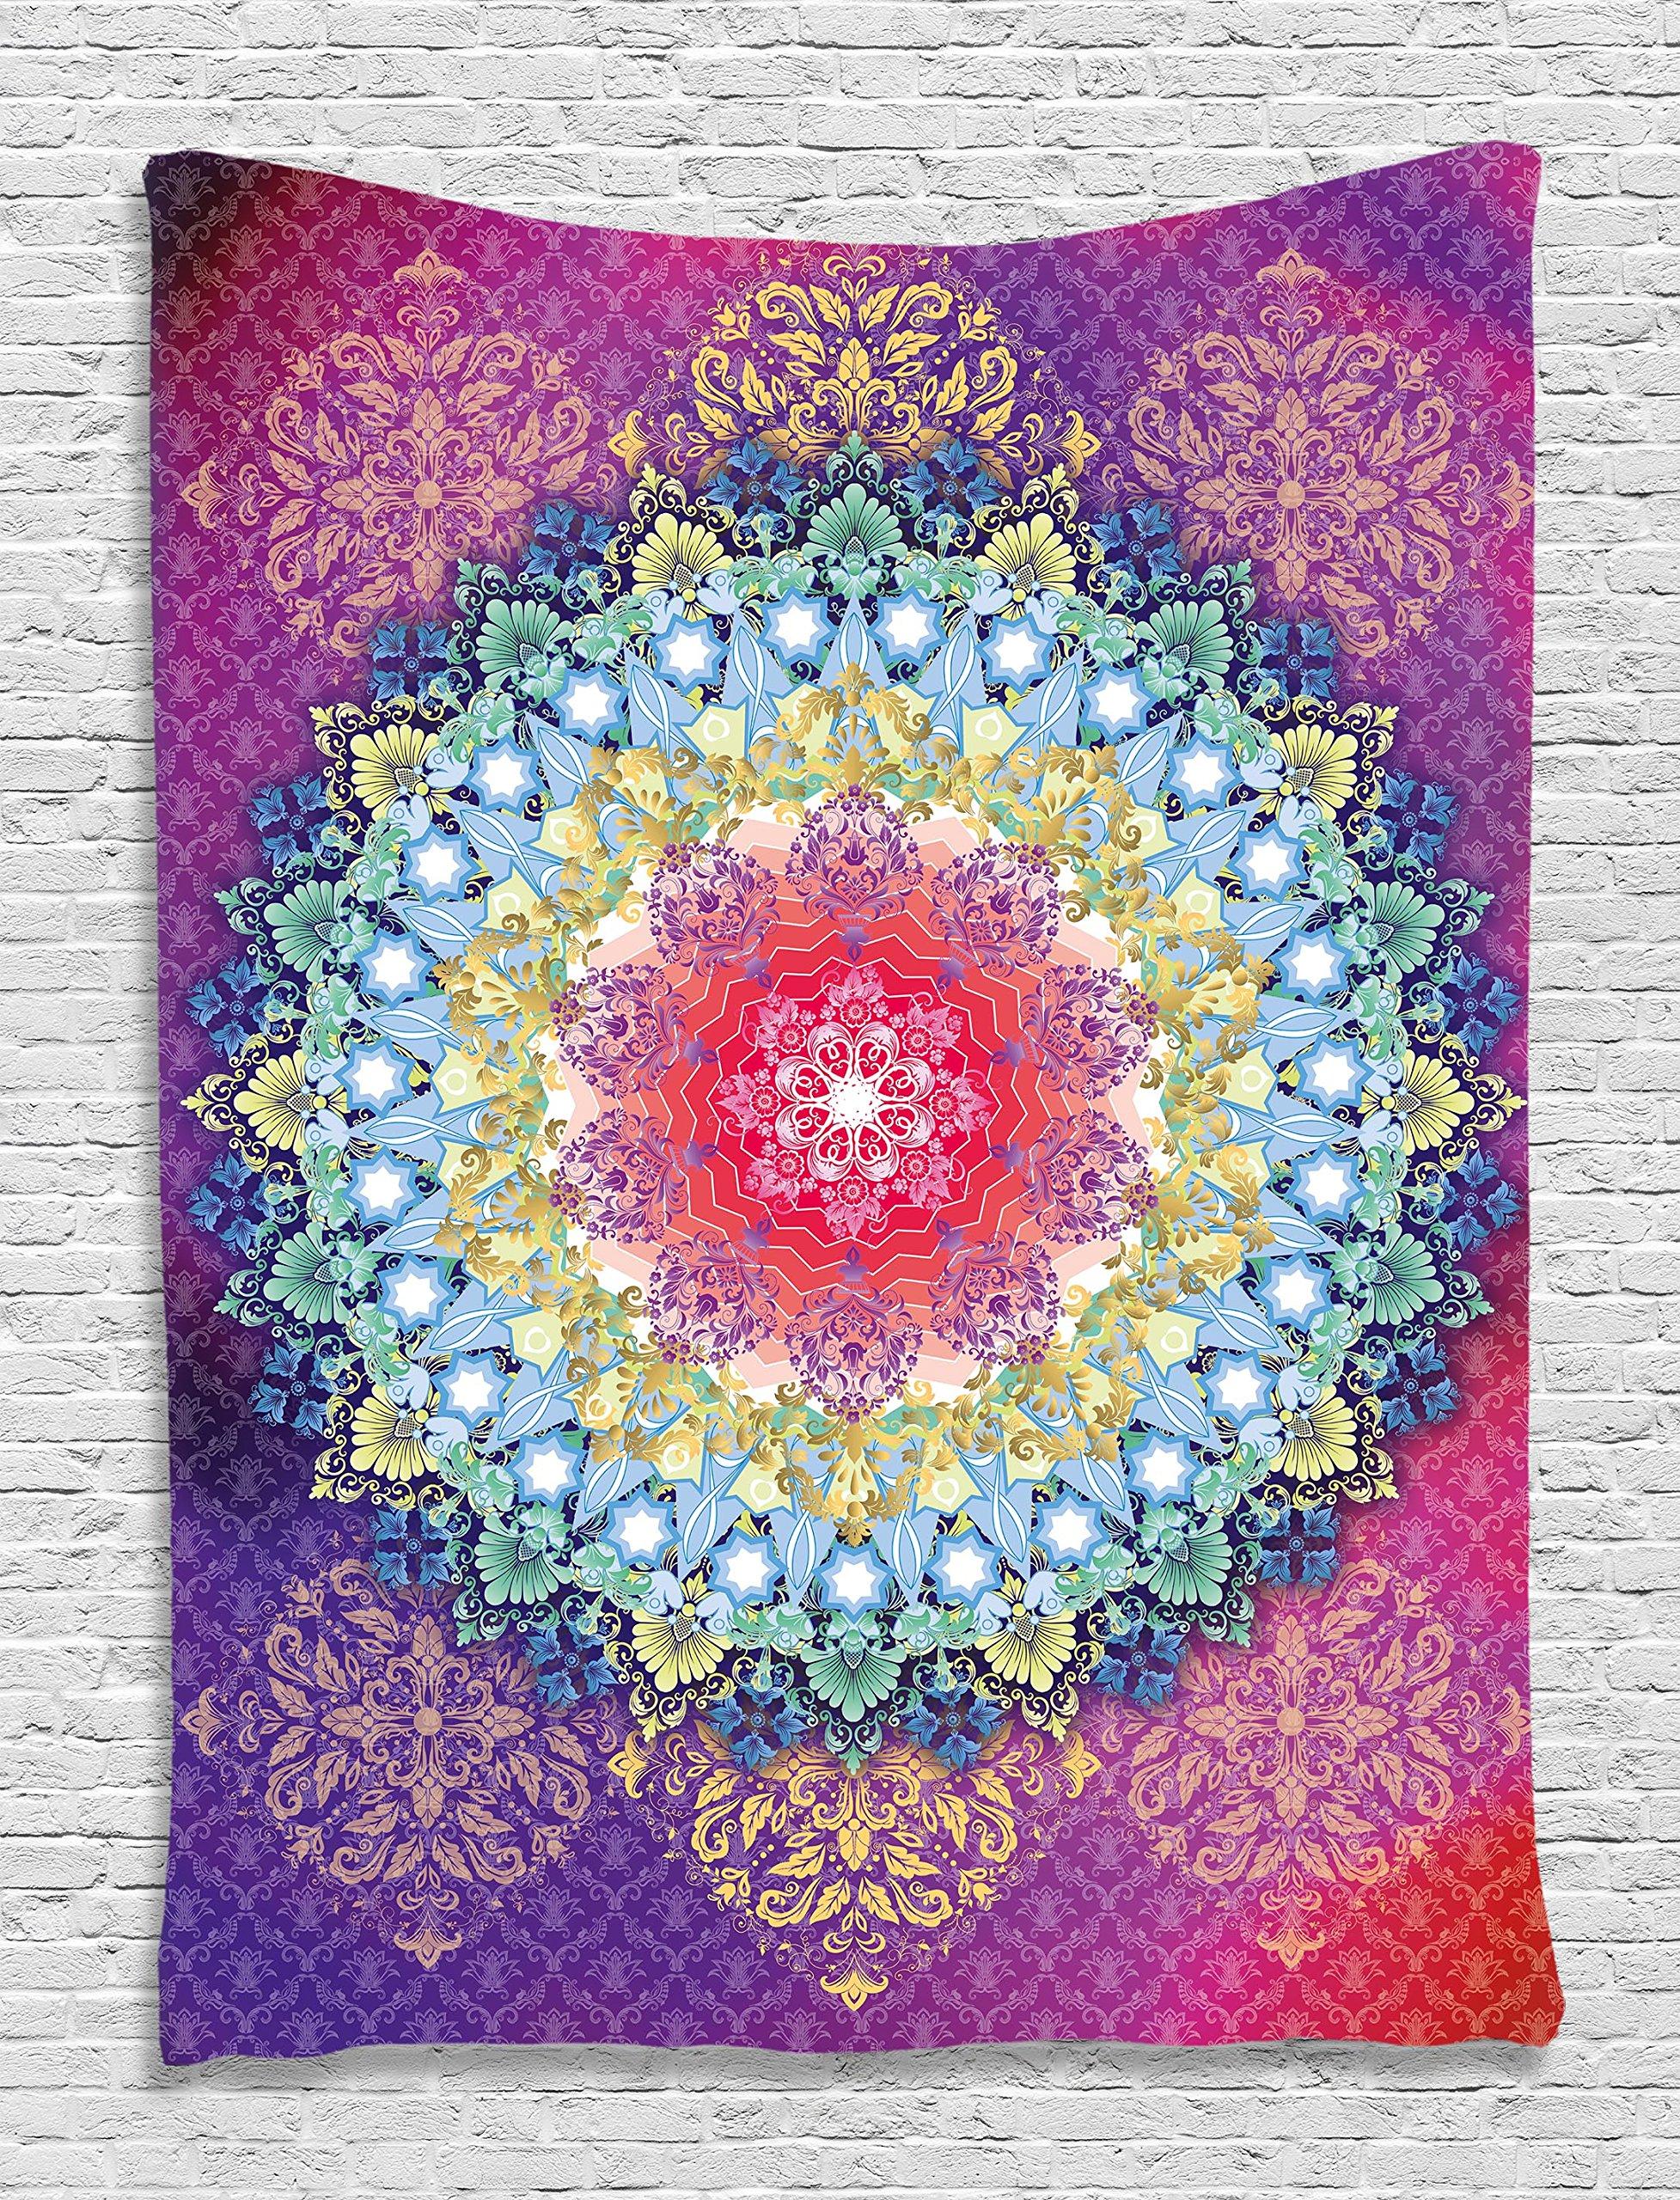 Magical Circle Dream World Four Elements Symbols Peace Zen Yoga Mandala Mystical Flames Color Festival Art Hanging Wall Tapestry Living Room Bedroom, Blue Fuchsia Purple Red Gold